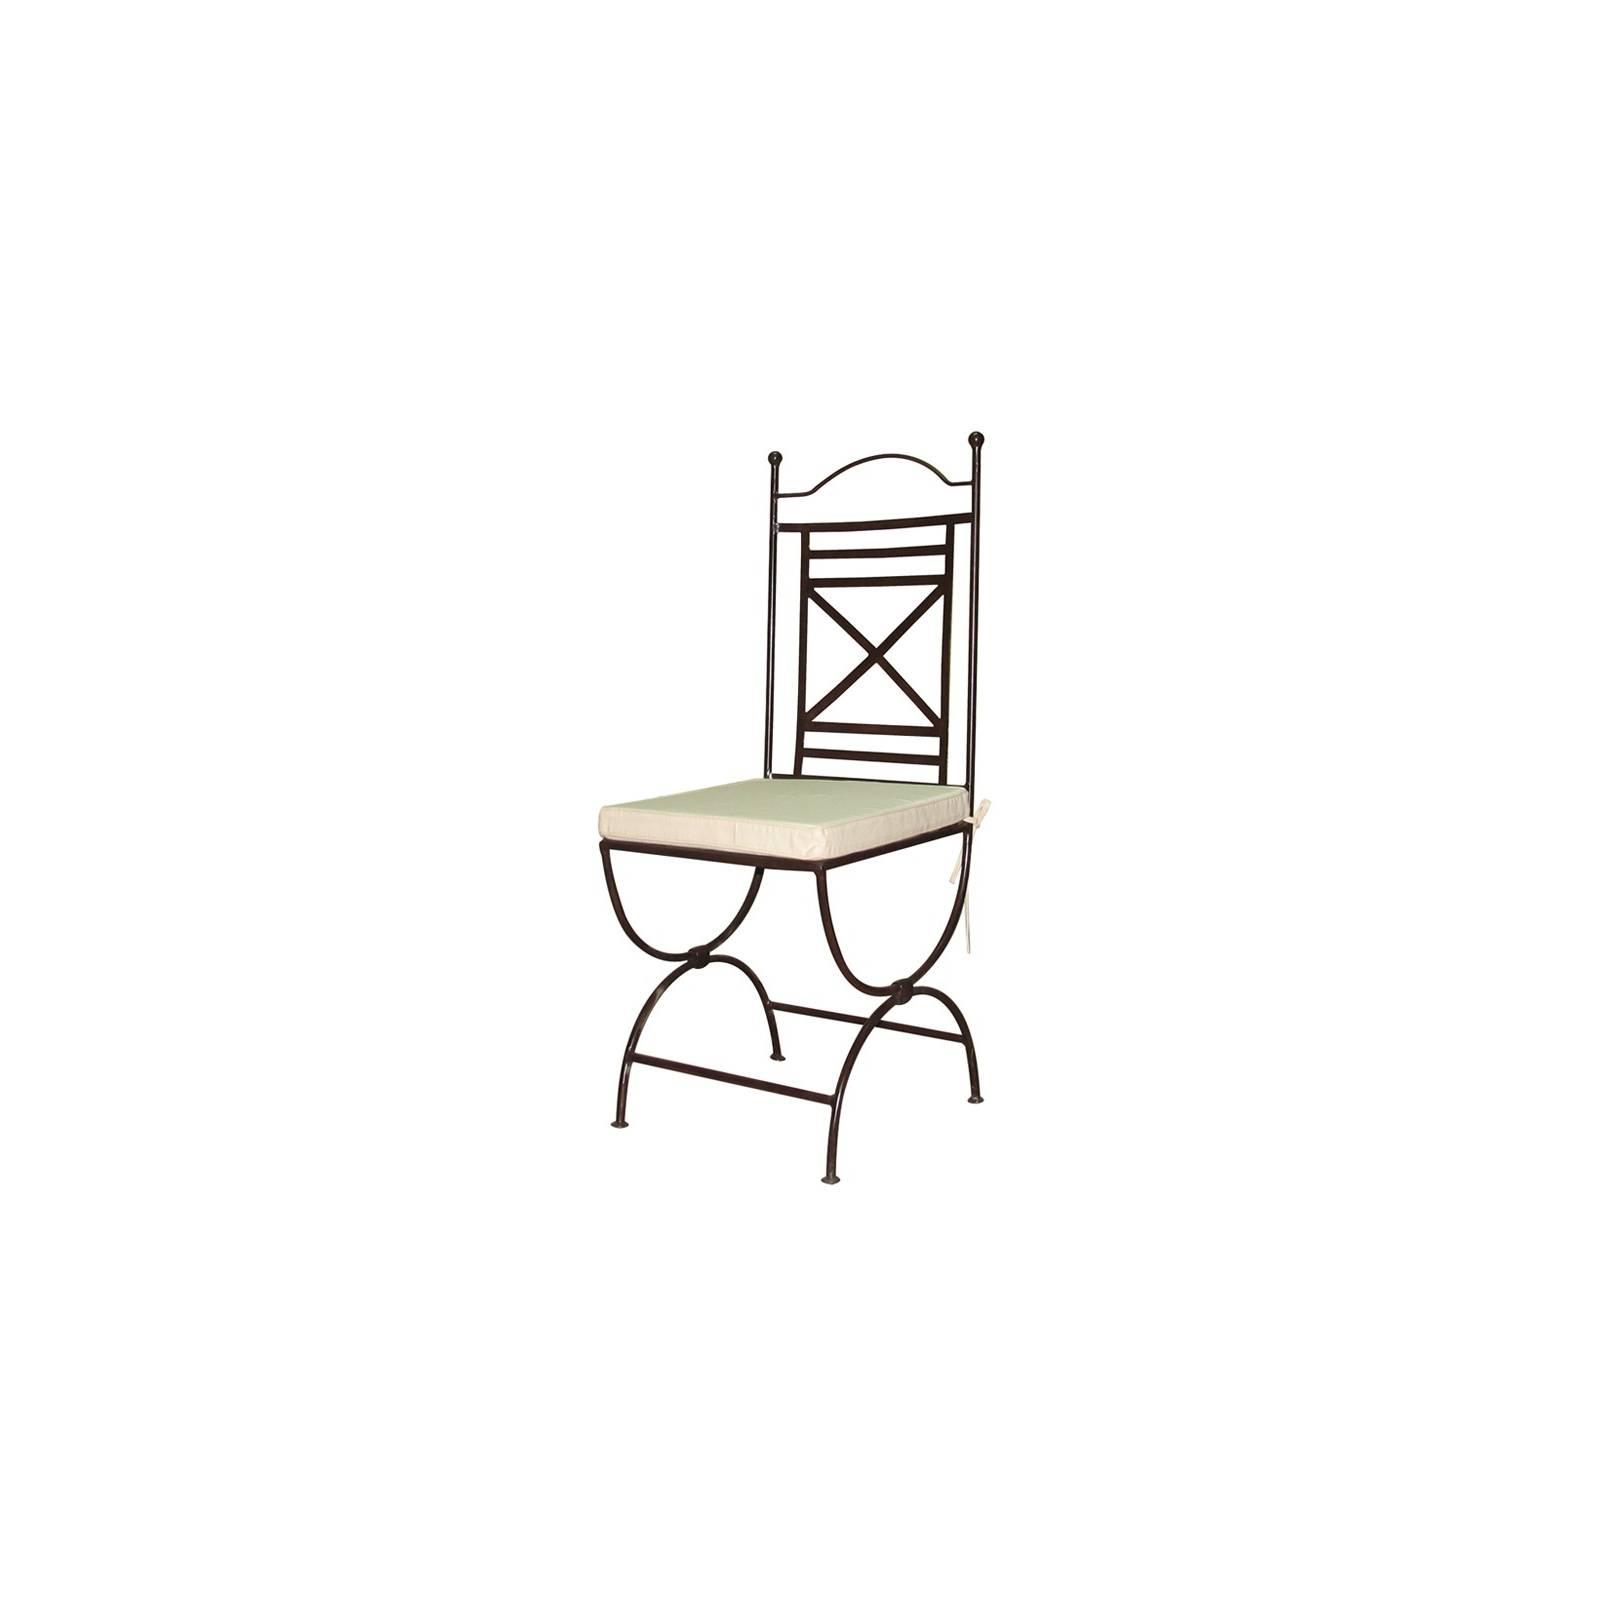 Chaise en fer forg dakhla salle manger classique for Chaise longue fer forge